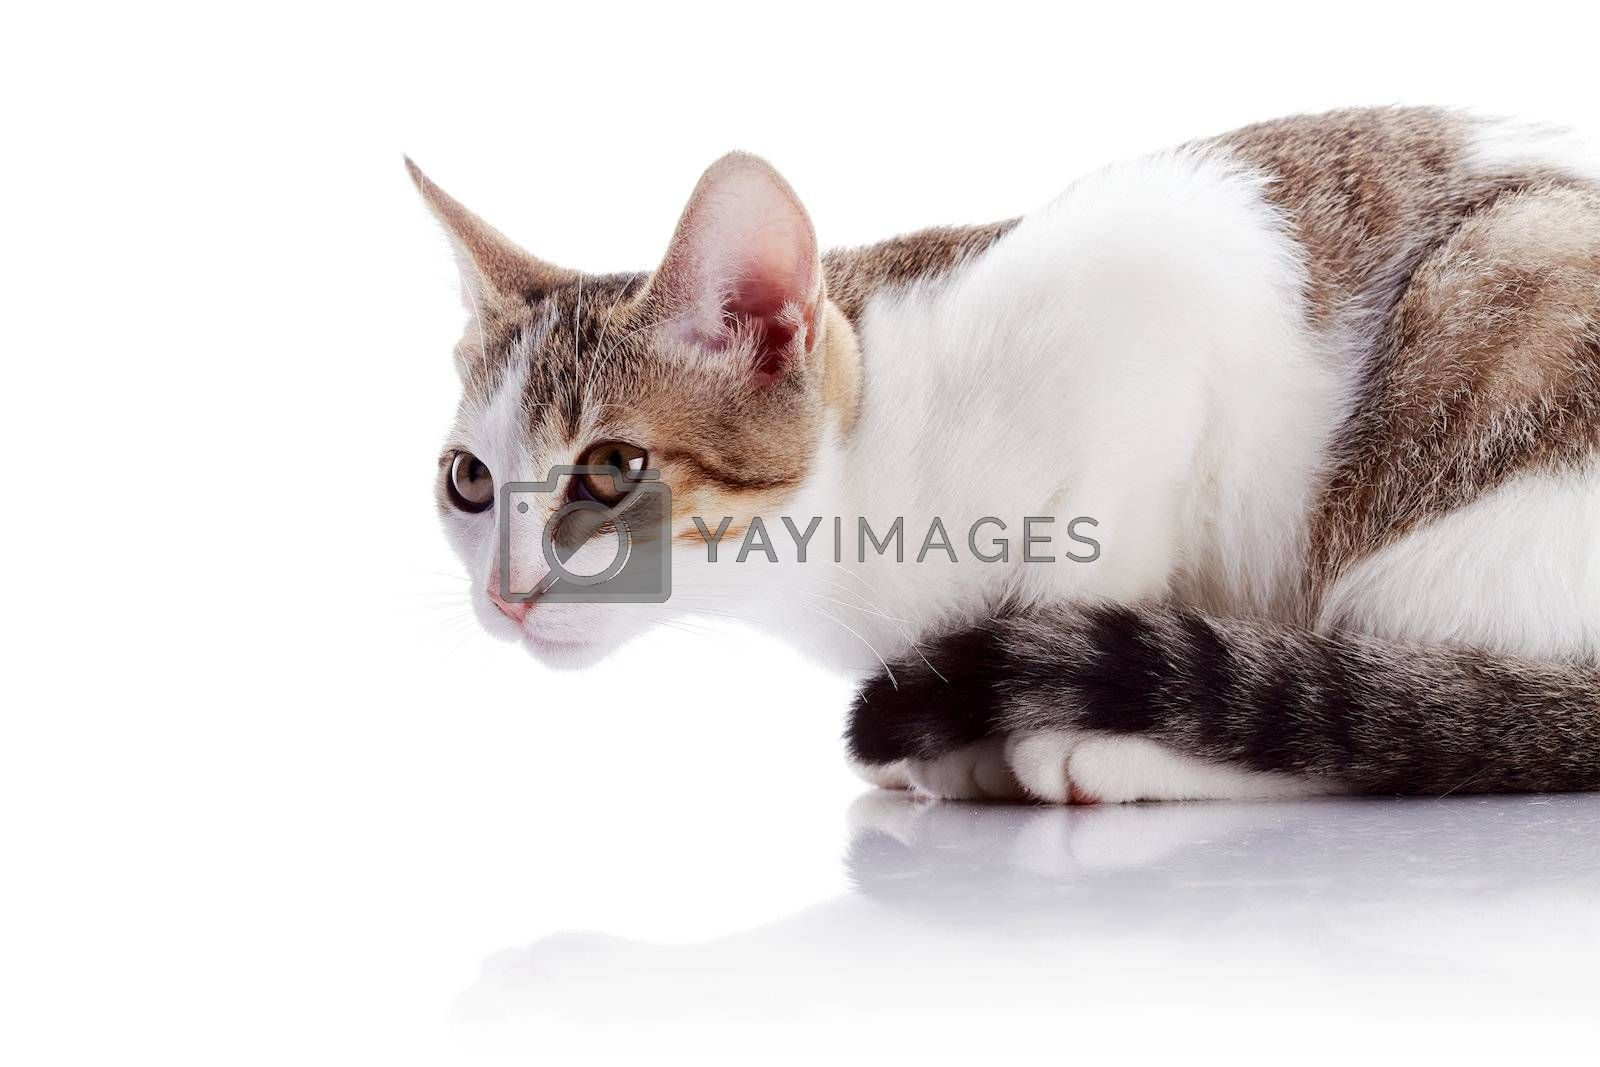 Royalty free image of The amusing kitten sits on a white background. by Azaliya